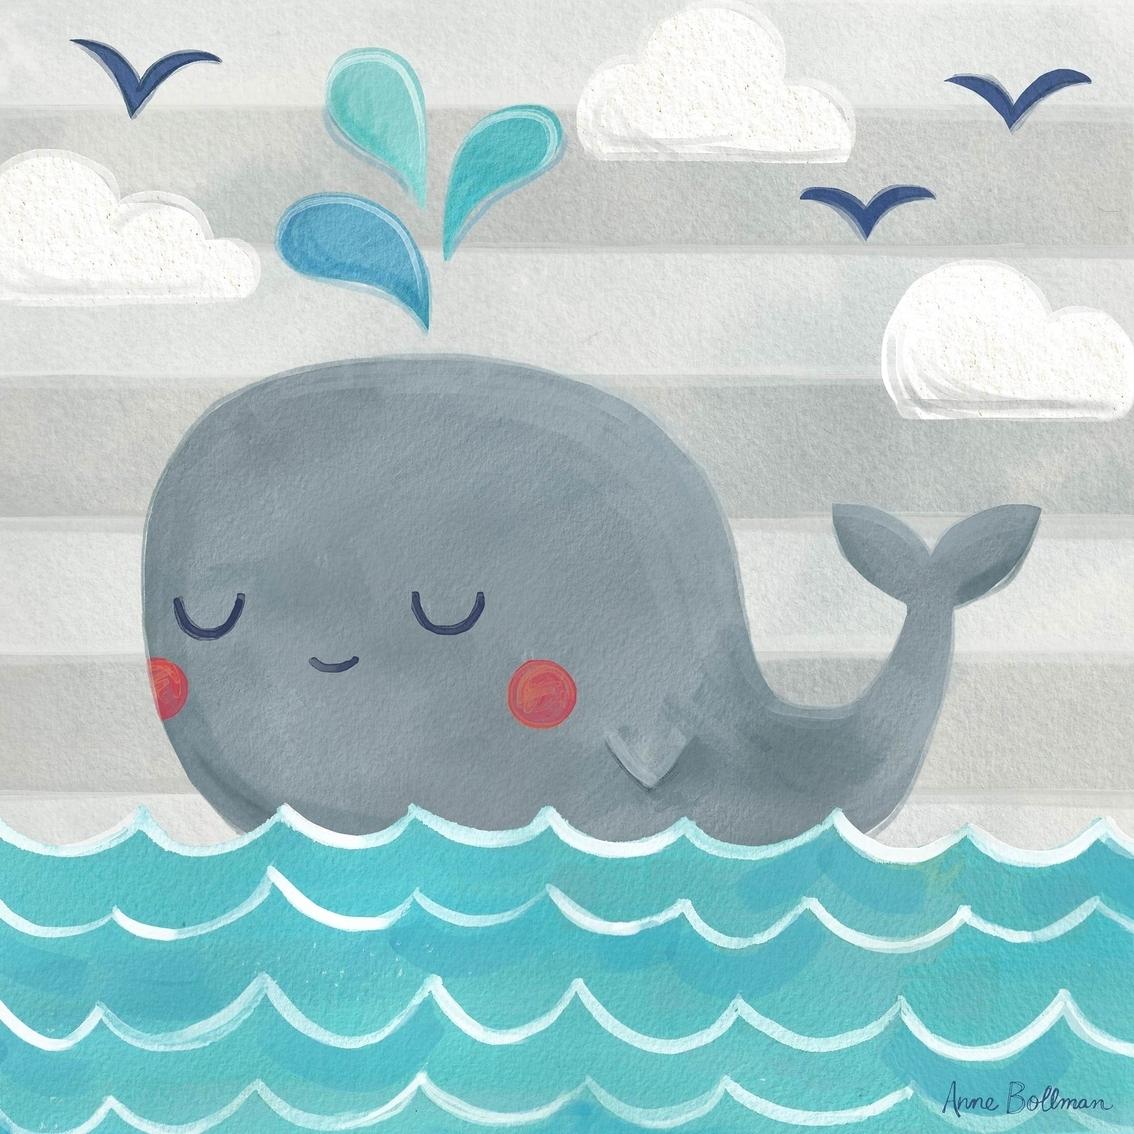 Greenbox Art 10 X 10 Let's Set Sail Whale Canvas Wall Art | Wall Intended For 2018 Whale Canvas Wall Art (View 10 of 20)